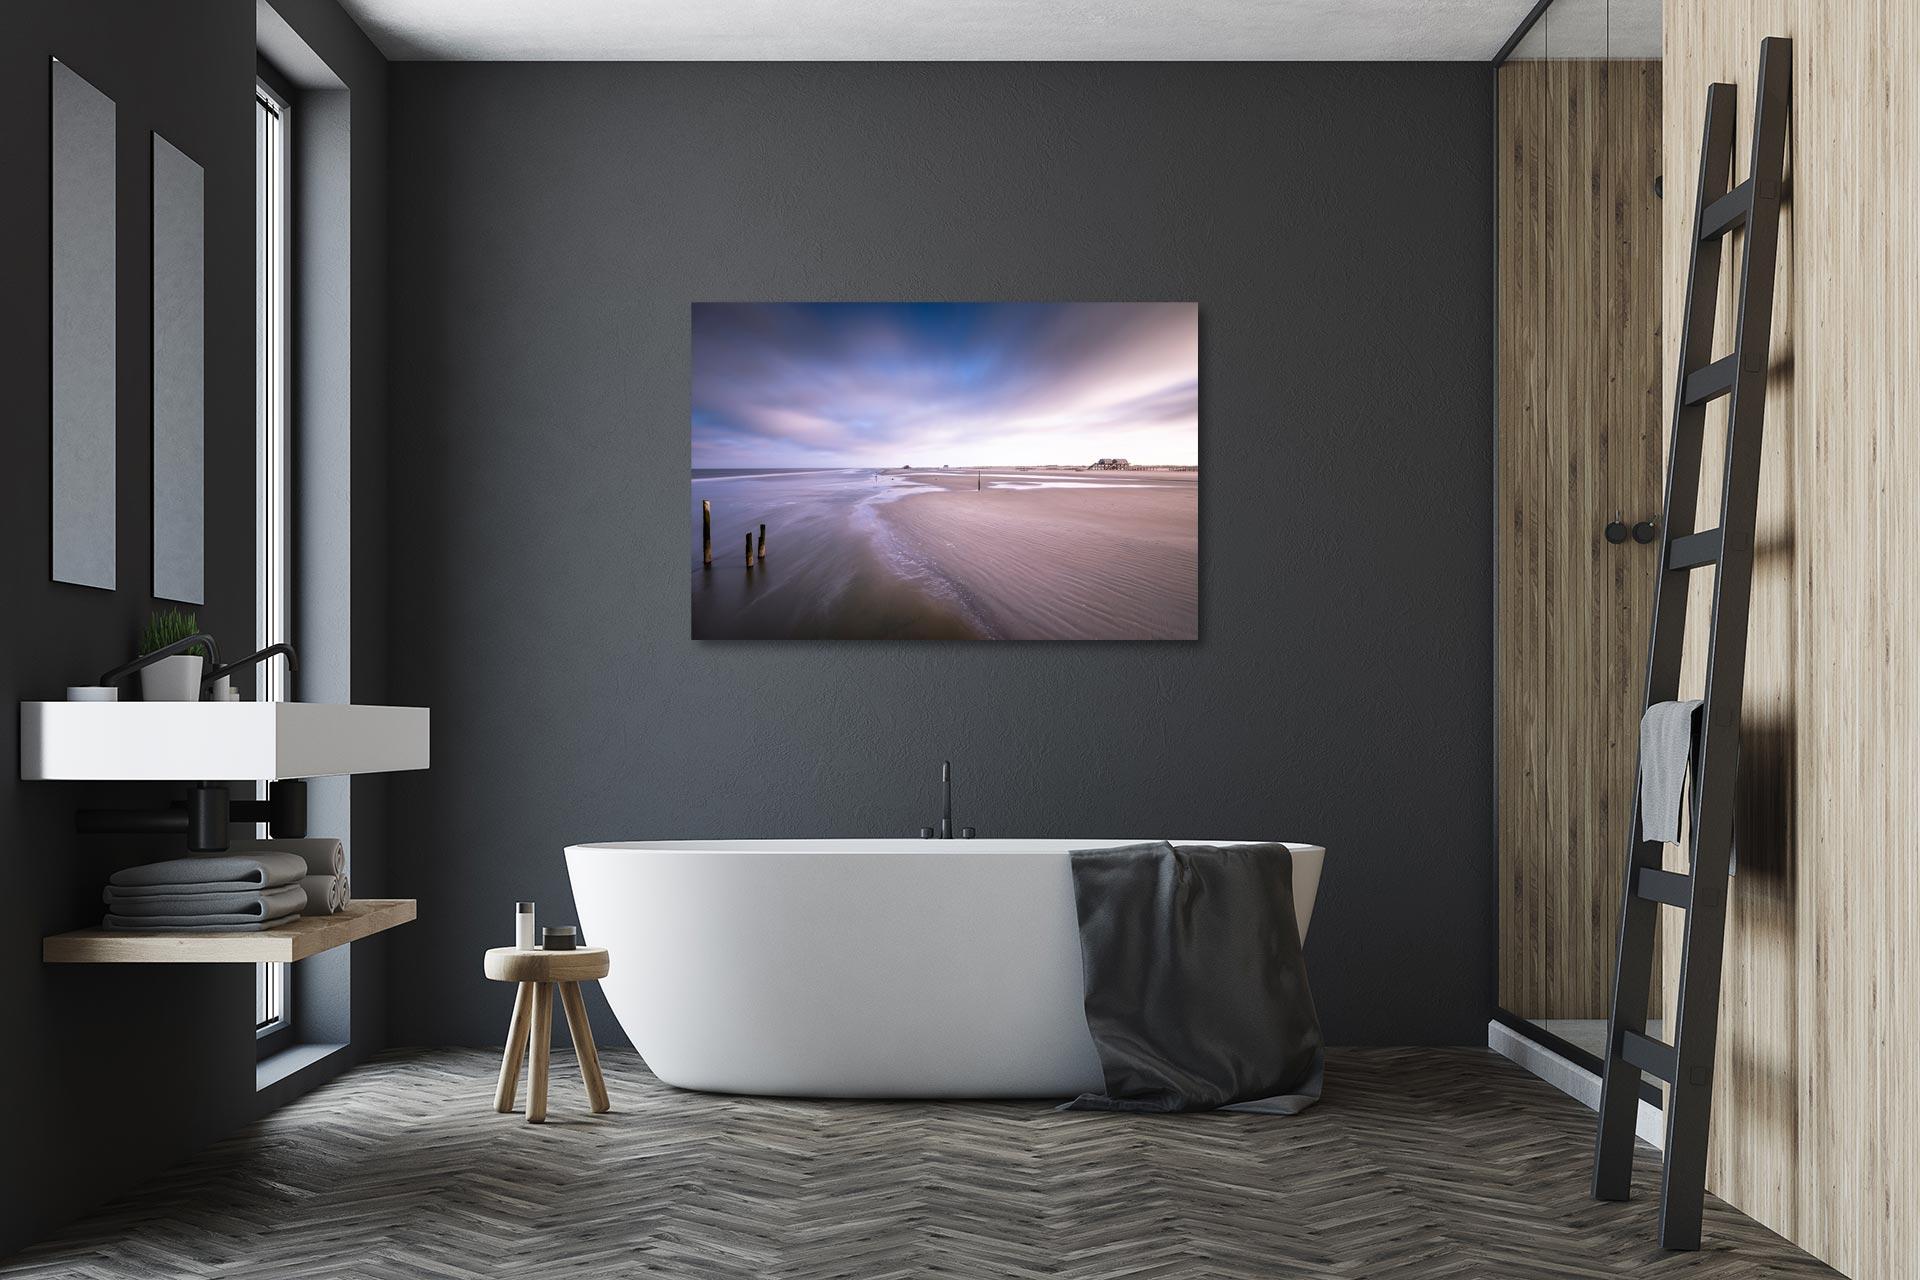 JS205-spo-1-bild-auf-leinwand-acrylglas-aludibond-badezimmer